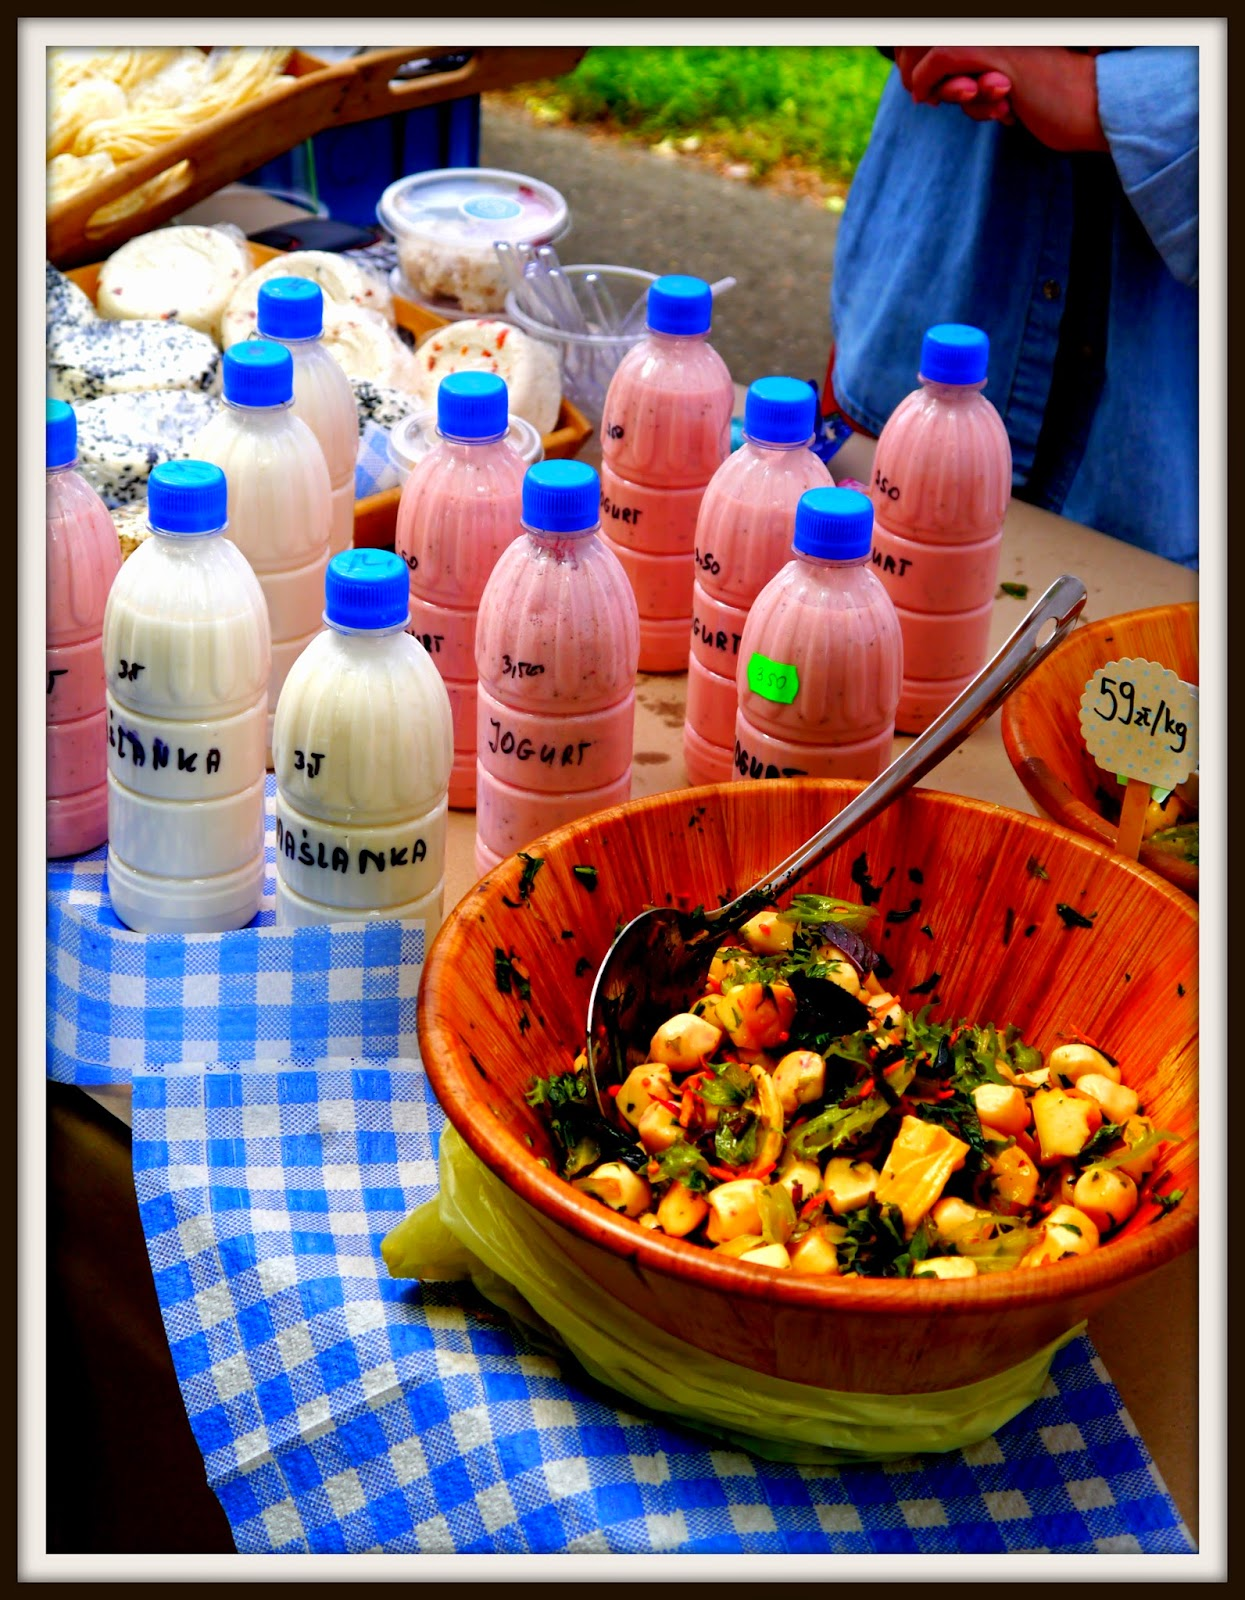 Targ Śniadaniowy, Park Krakowski, jogurt, kefir, maślanka